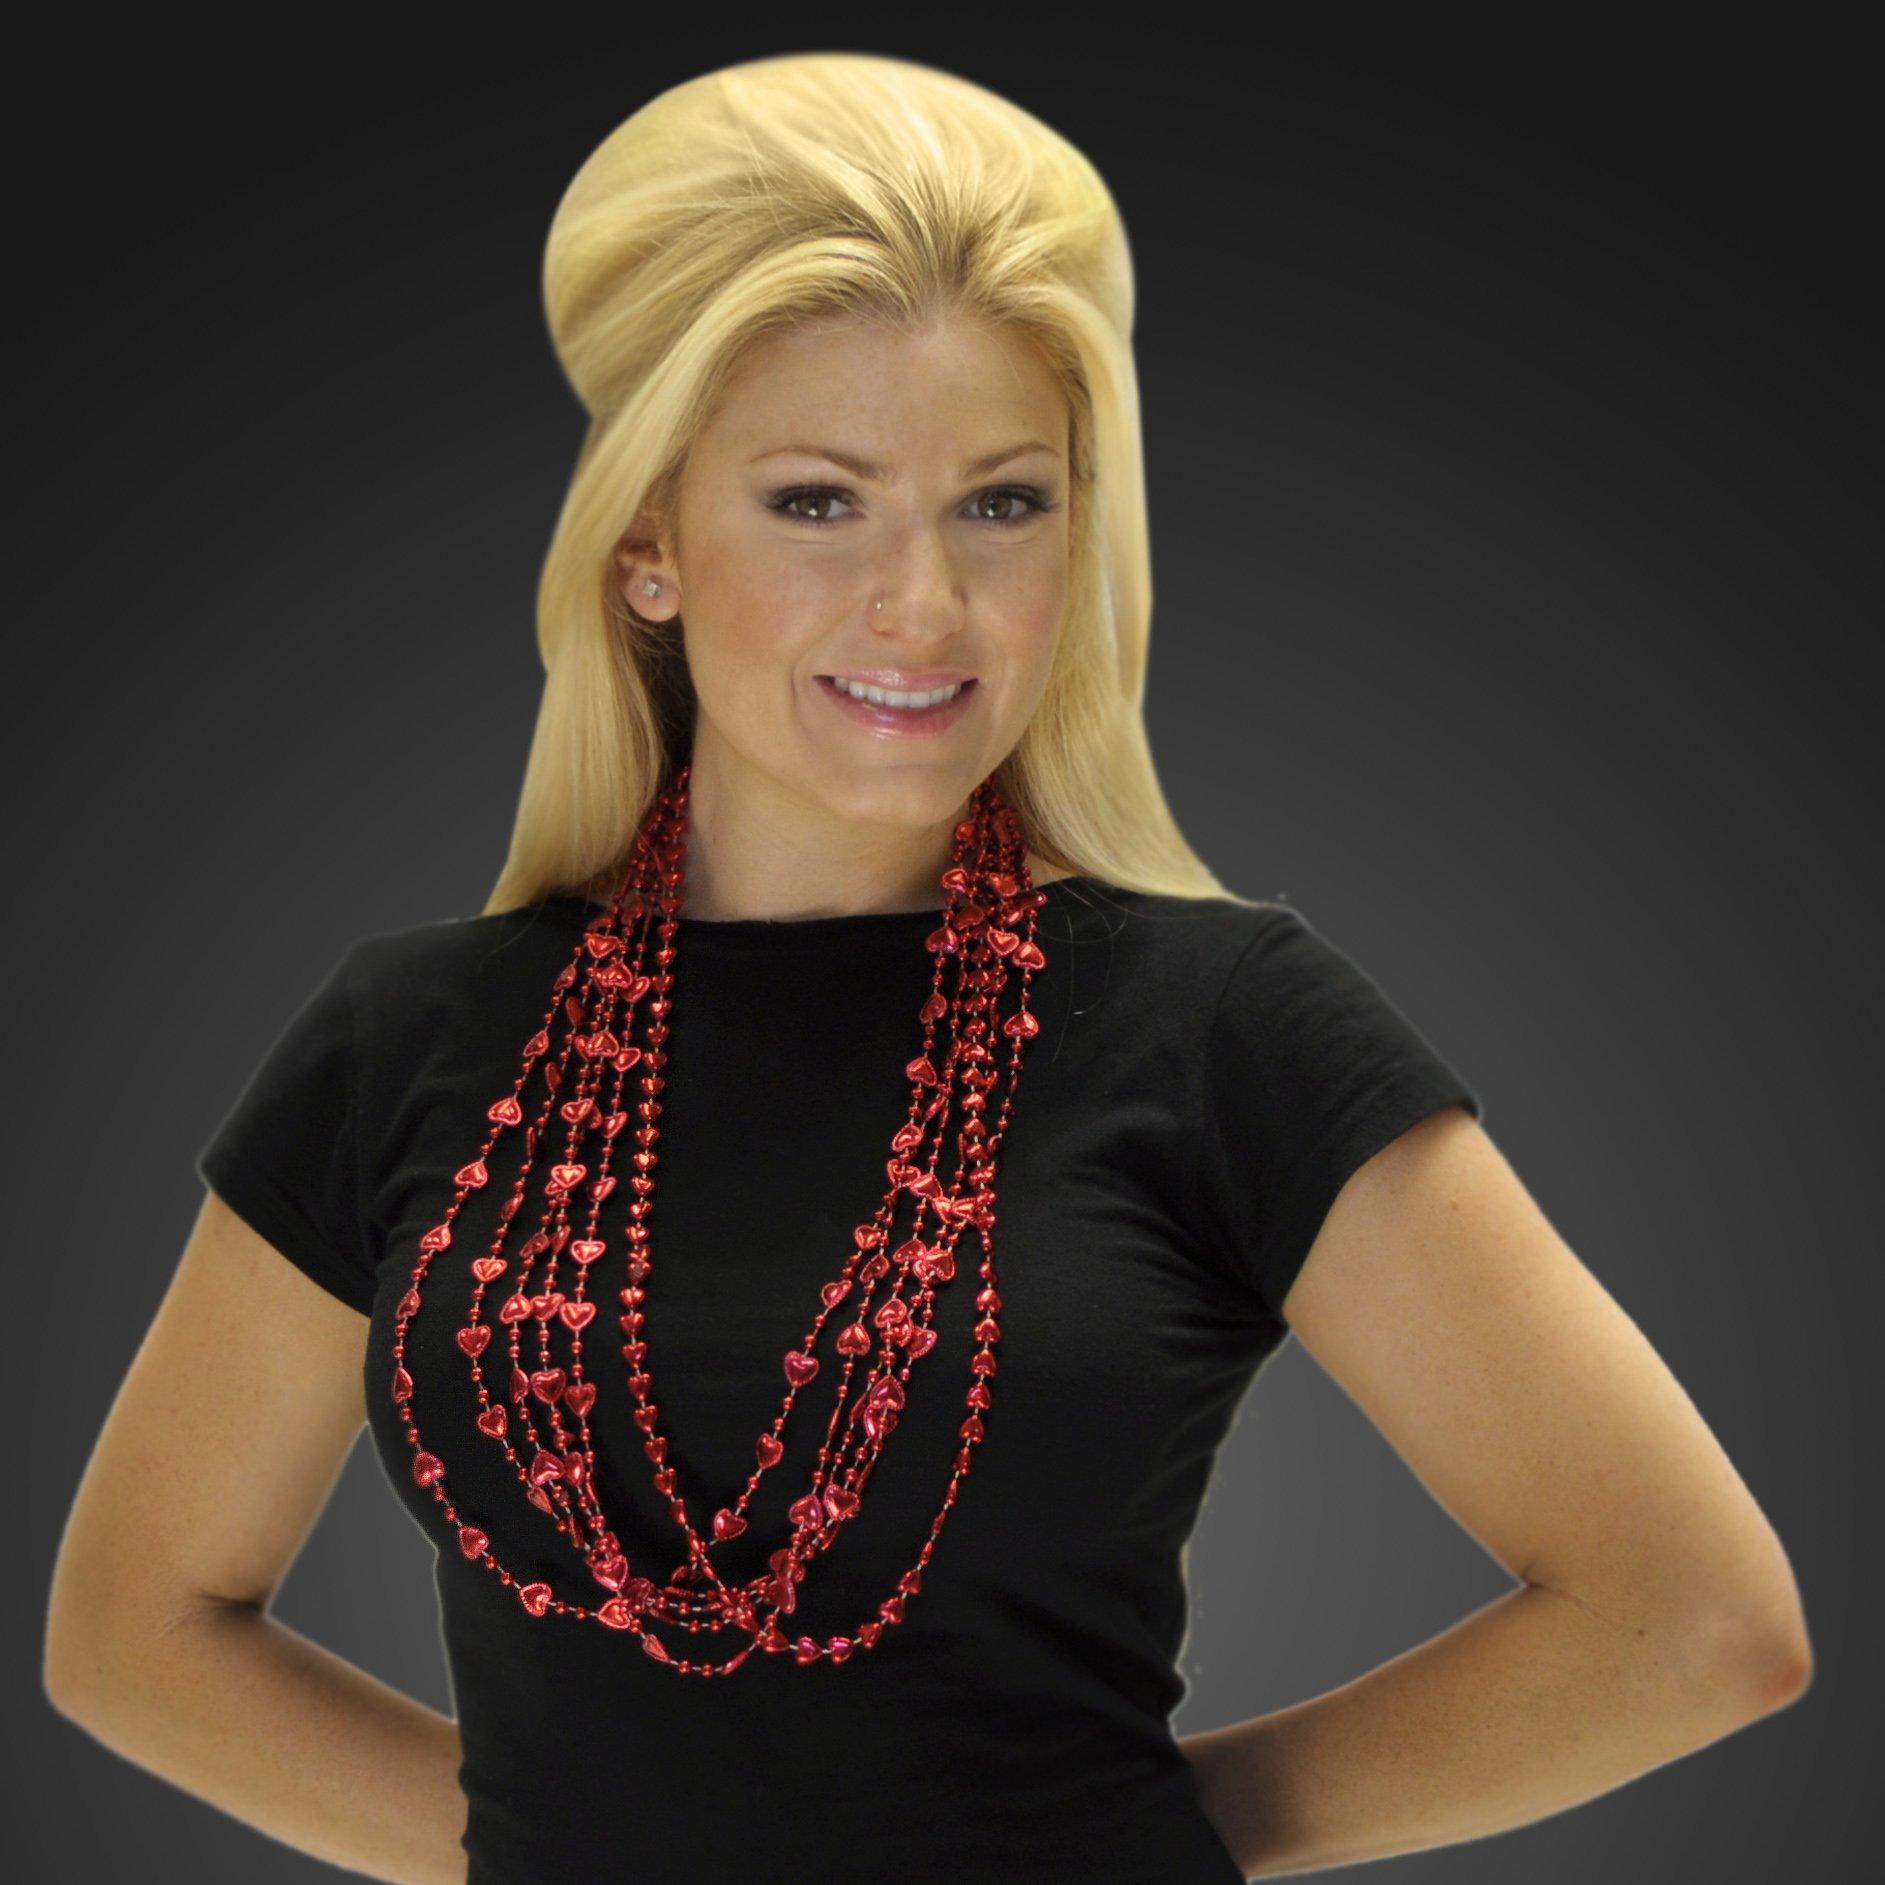 FlashingBlinkyLights Red Heart Mardi Gras Bead Necklaces (Set of 144)